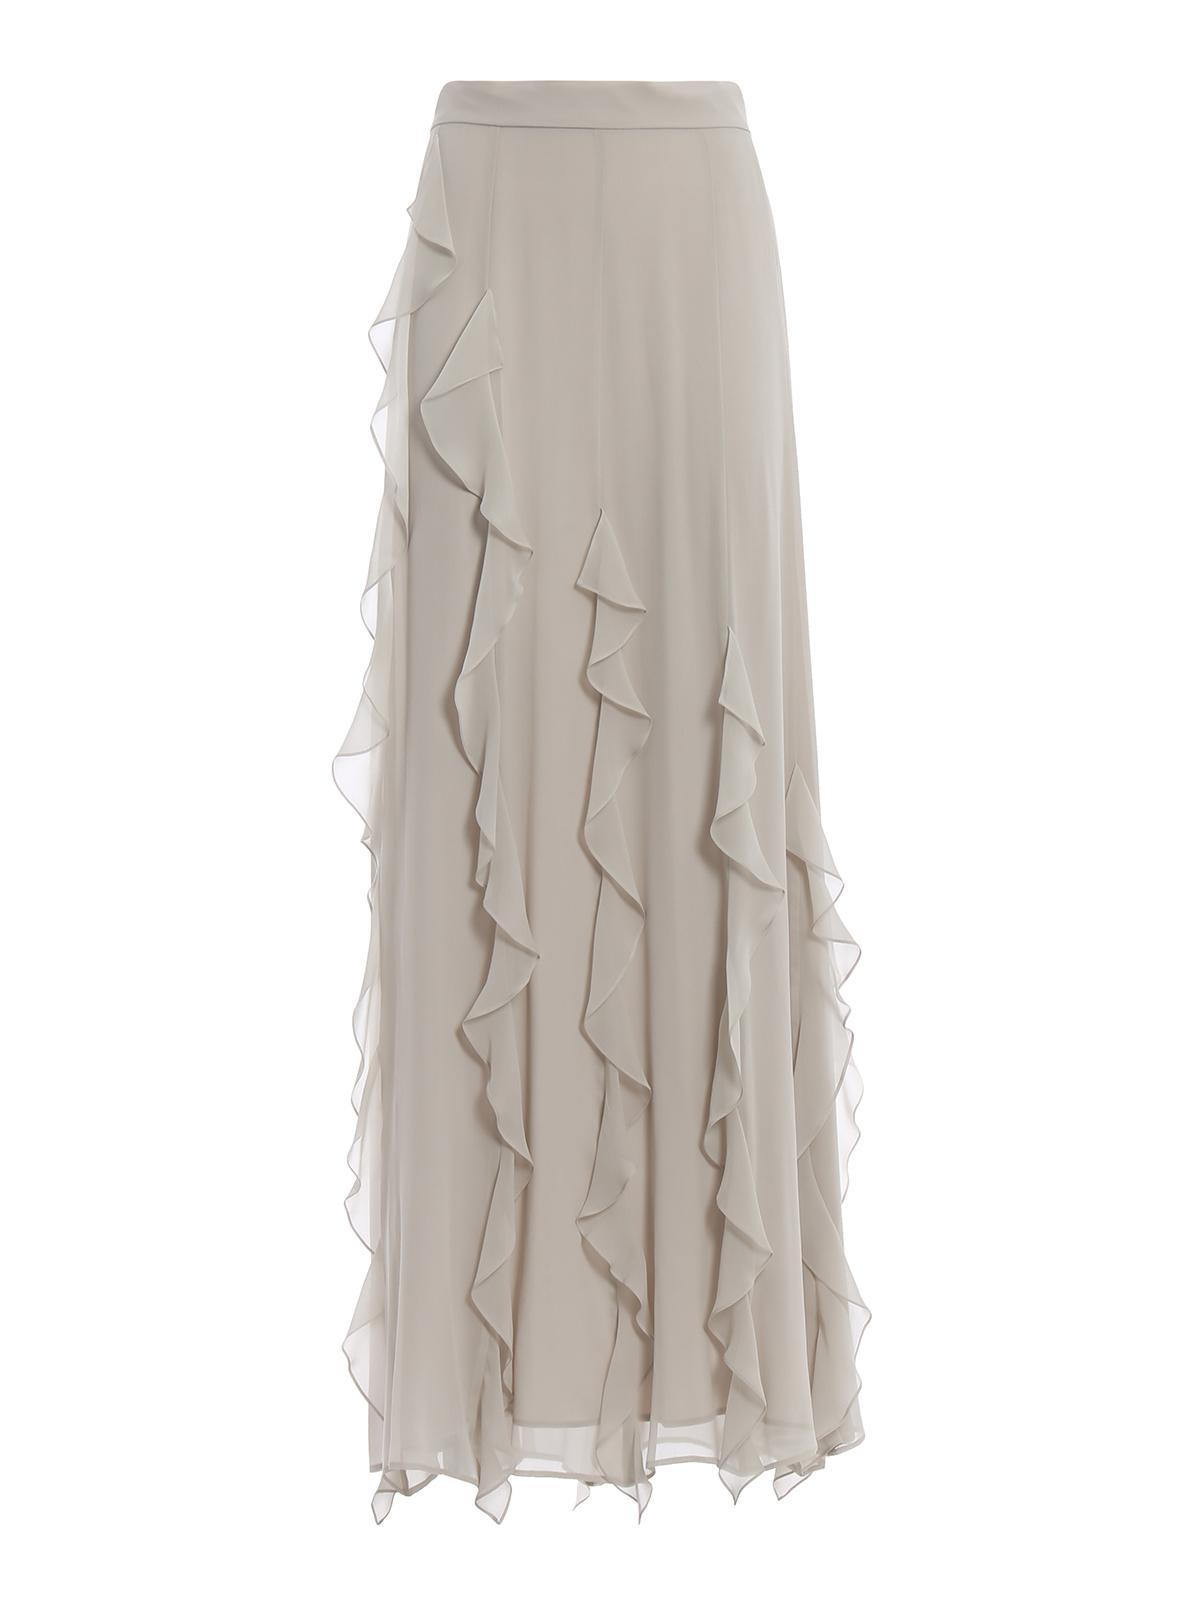 637a52cb8 Max Mara - Serafin frilled silk long skirt - Long skirts ...